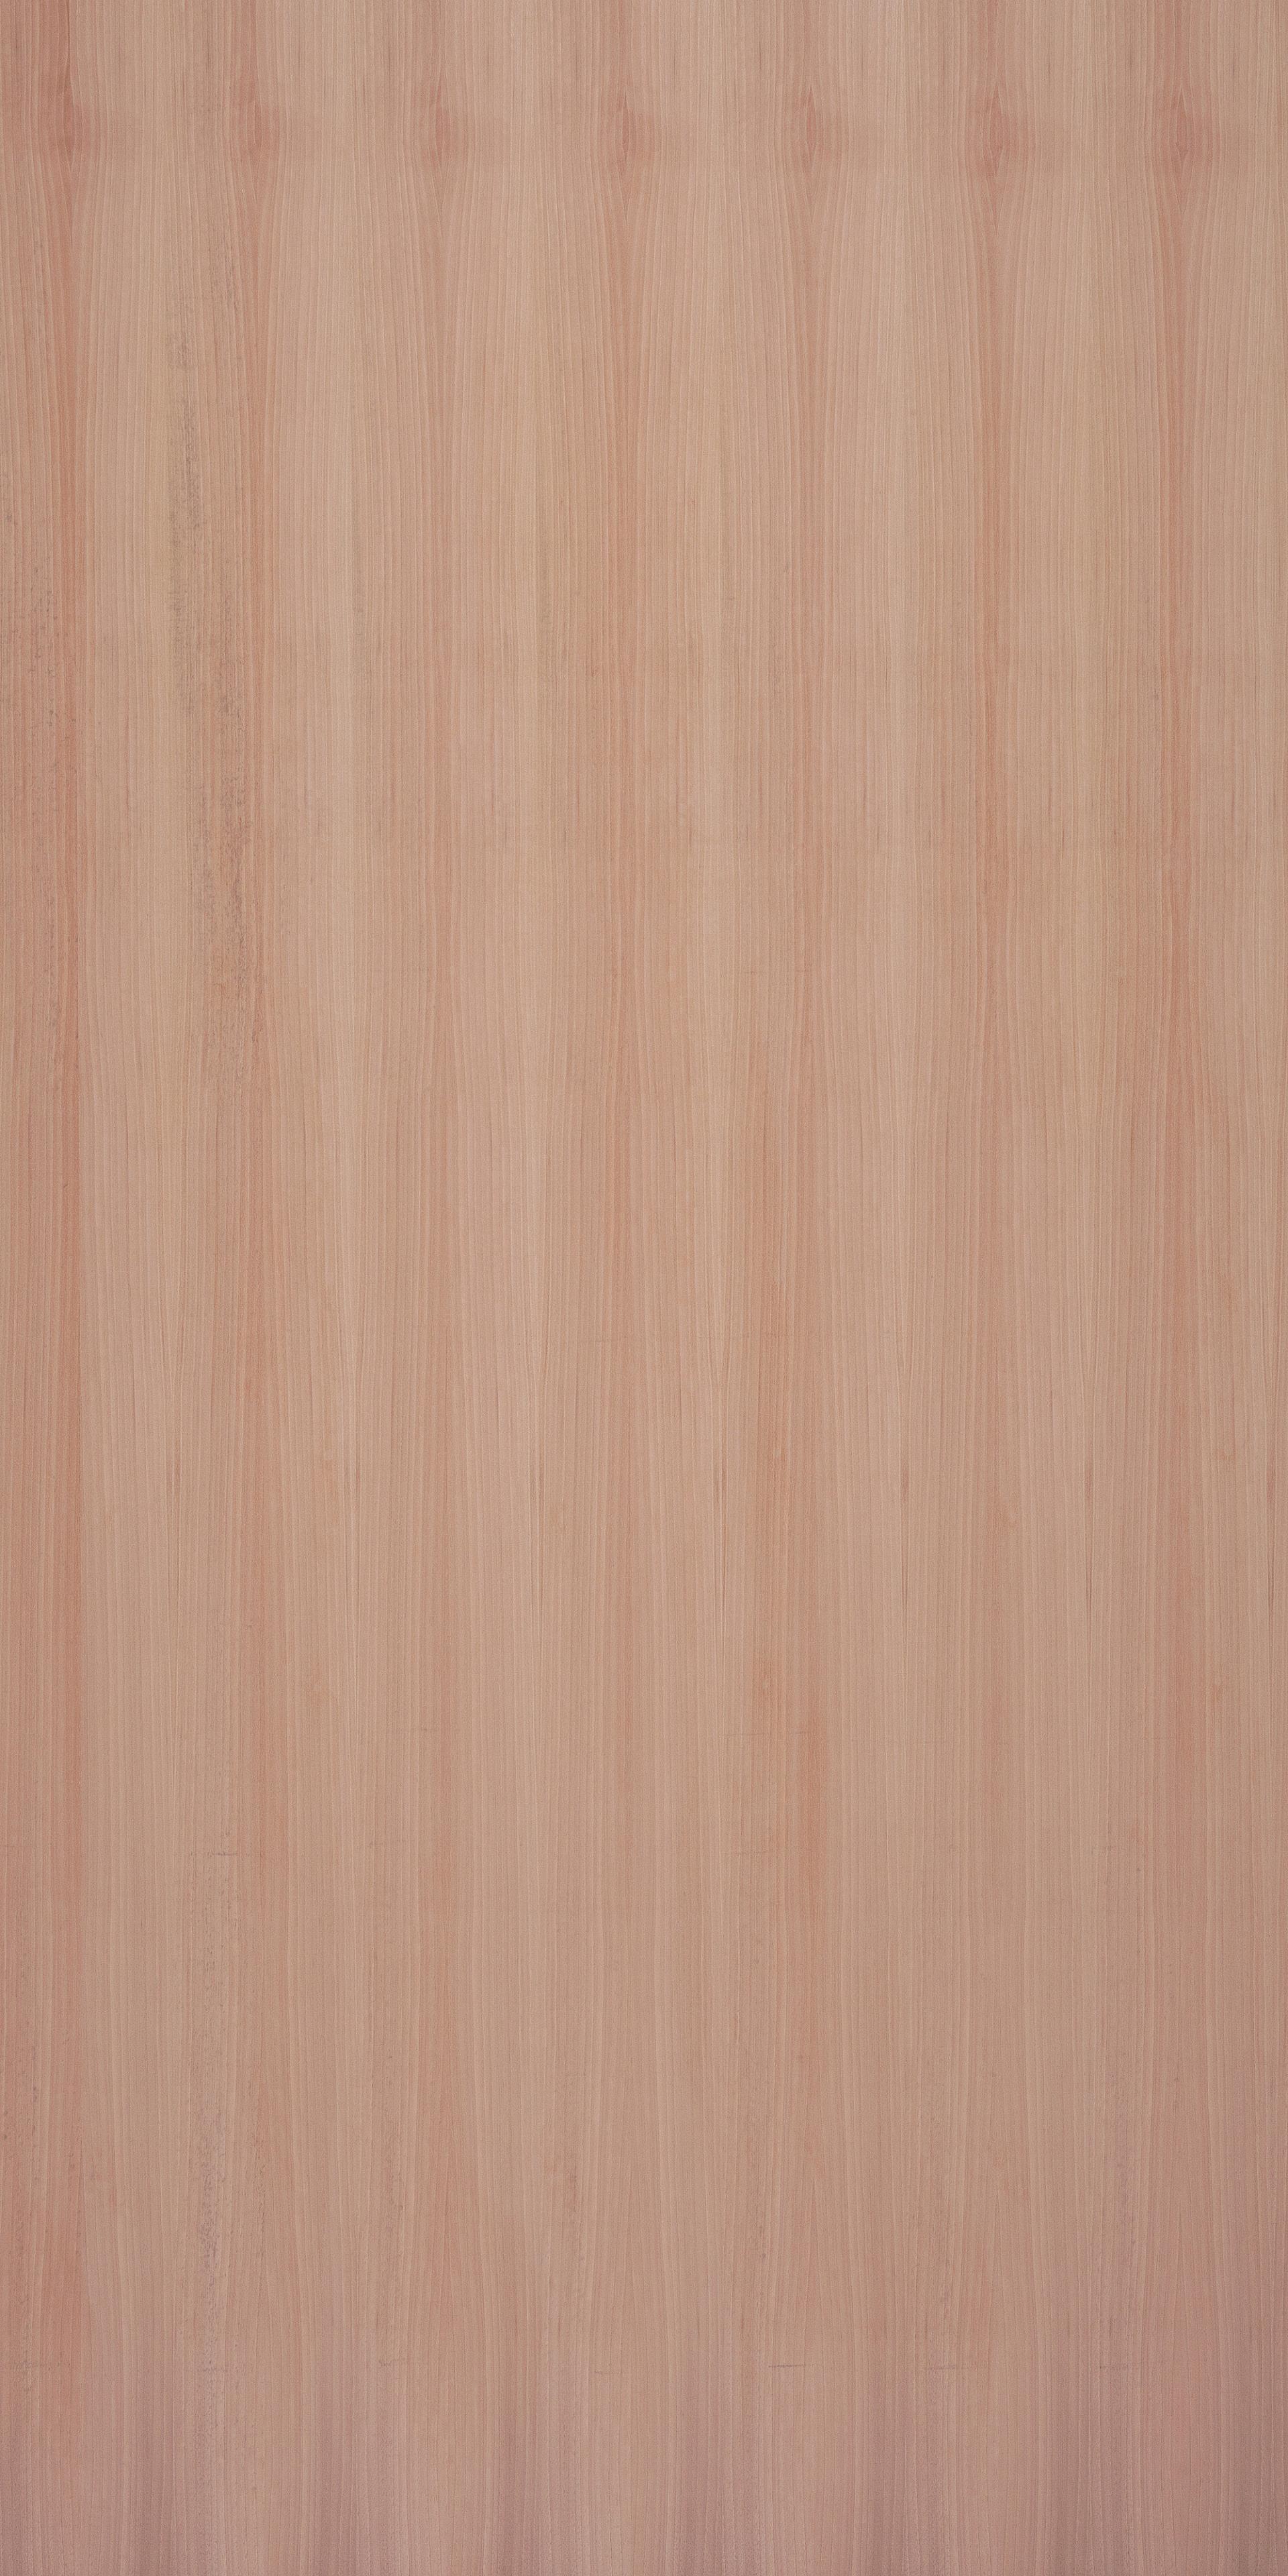 Walnut Italian Decospan